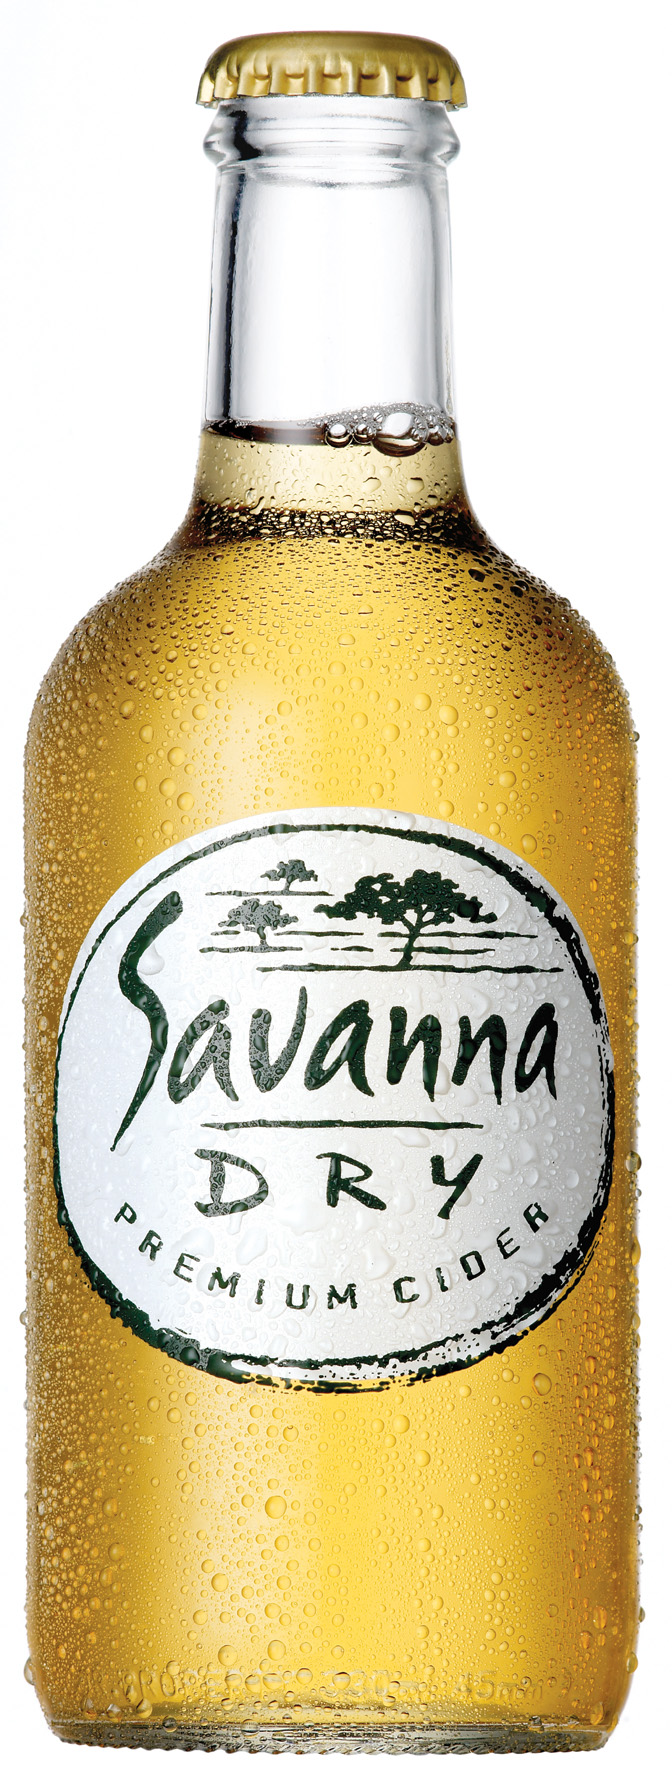 Savanna Premium Cider Distell Südafrika 5.50 % Vol.